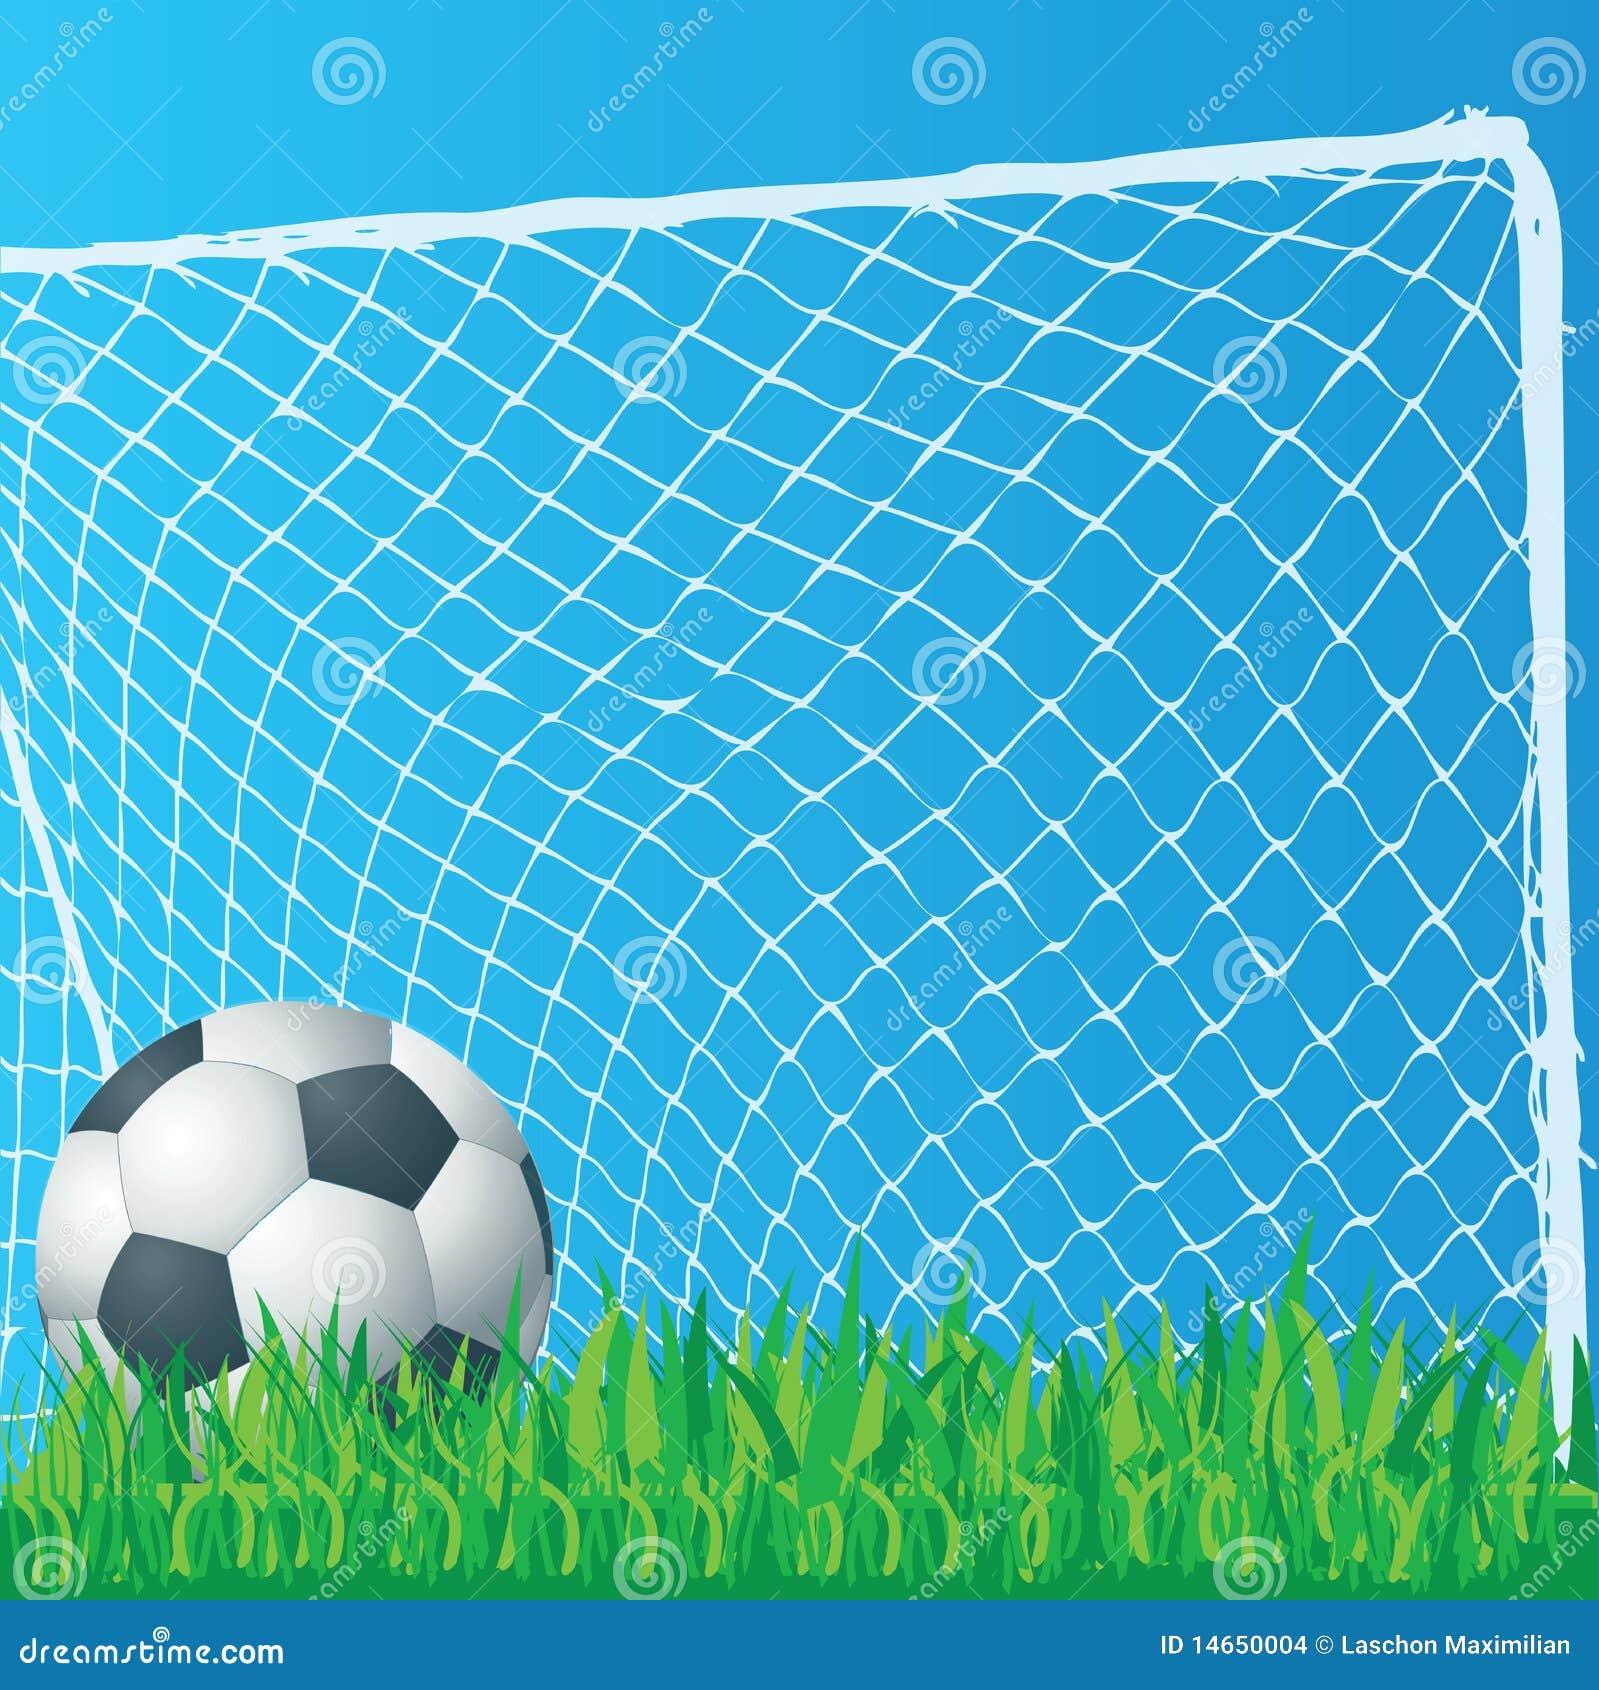 Soccer Score Clipart